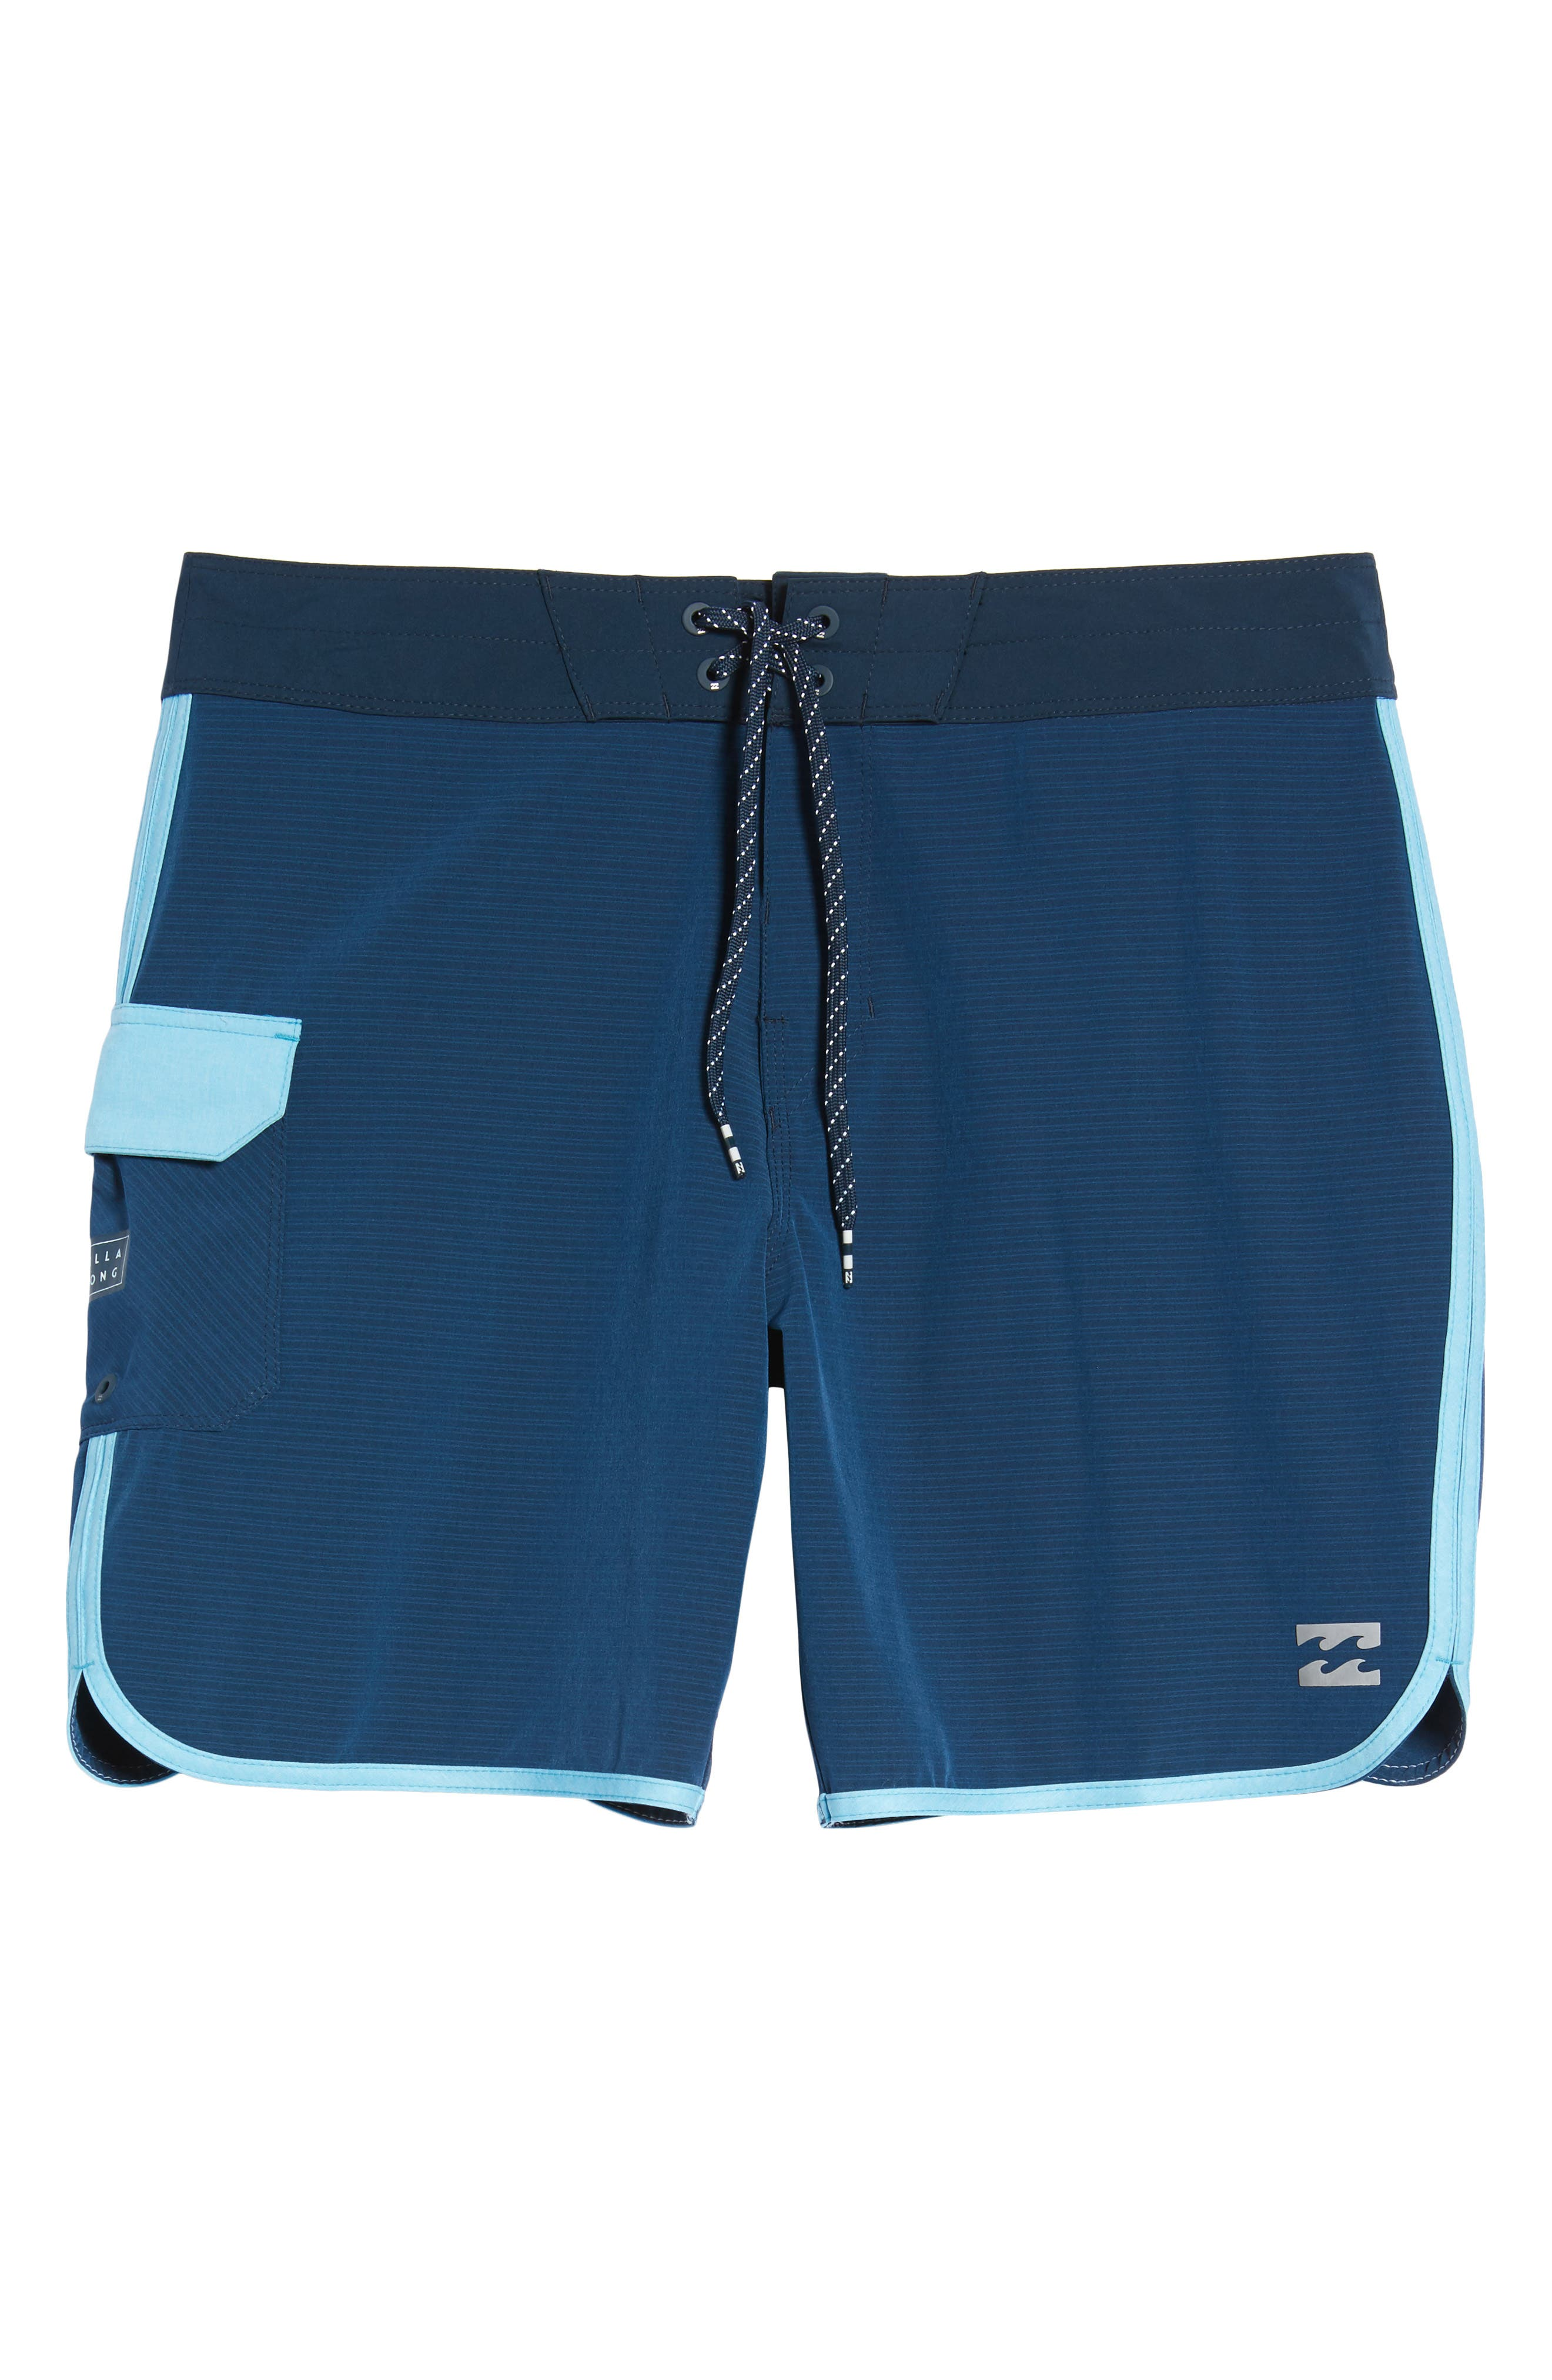 73 X Short Board Shorts,                             Alternate thumbnail 6, color,                             Navy